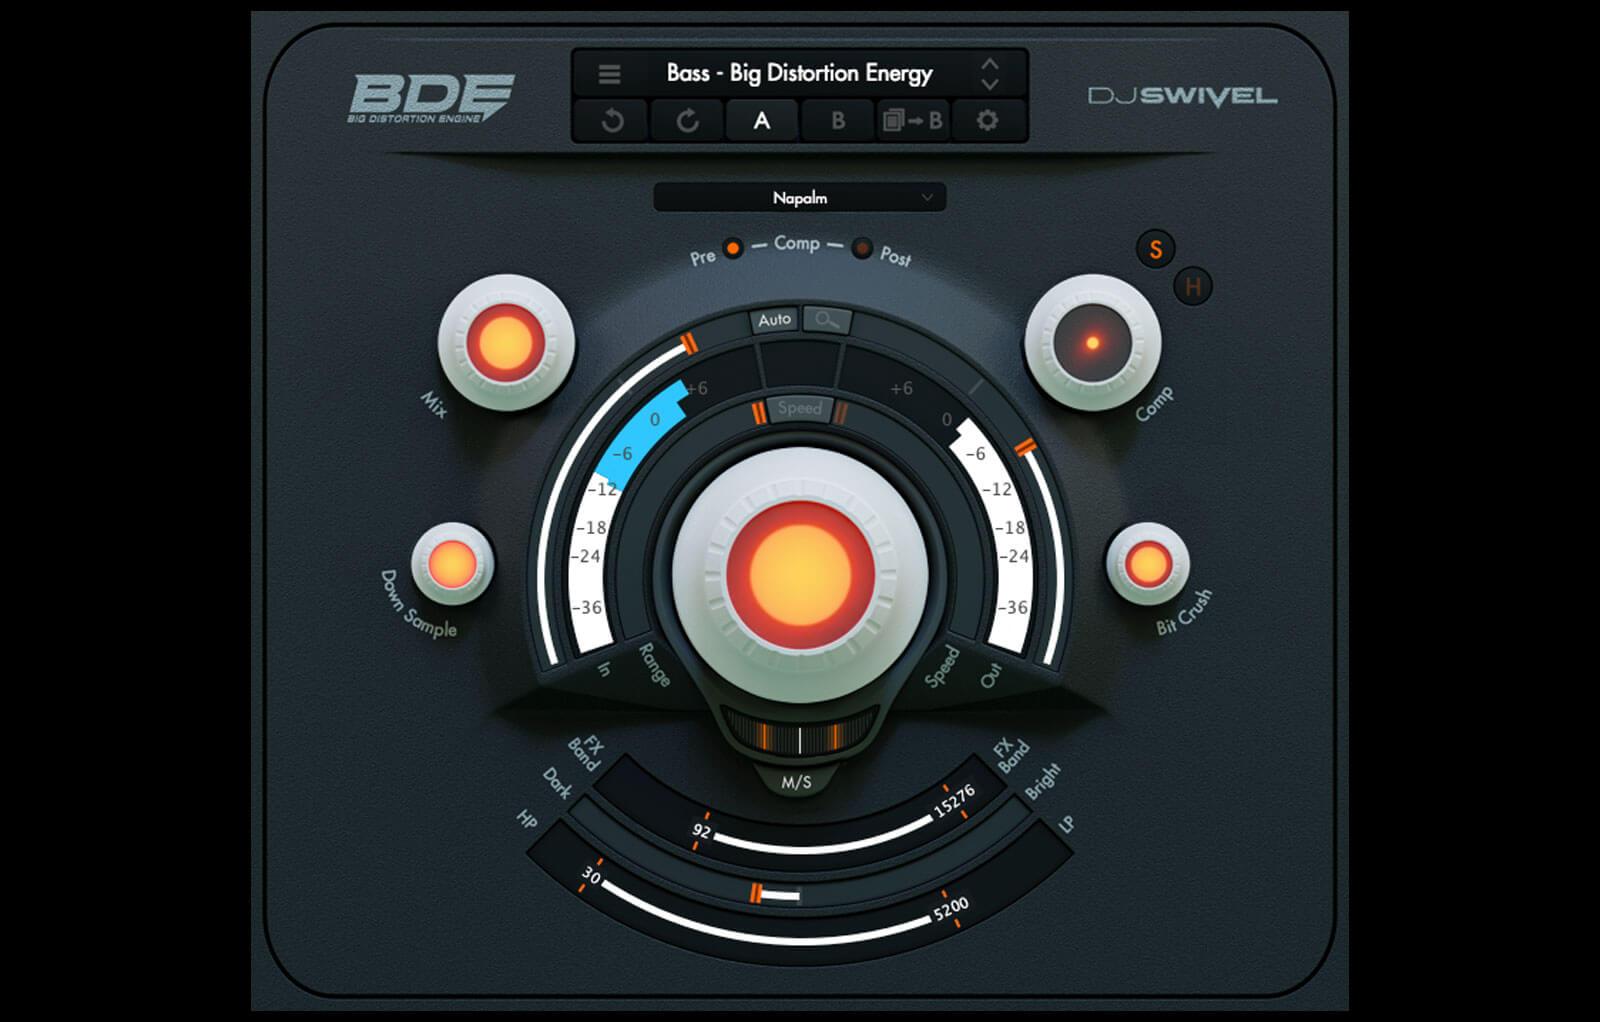 BDE: Big Distortion Engine